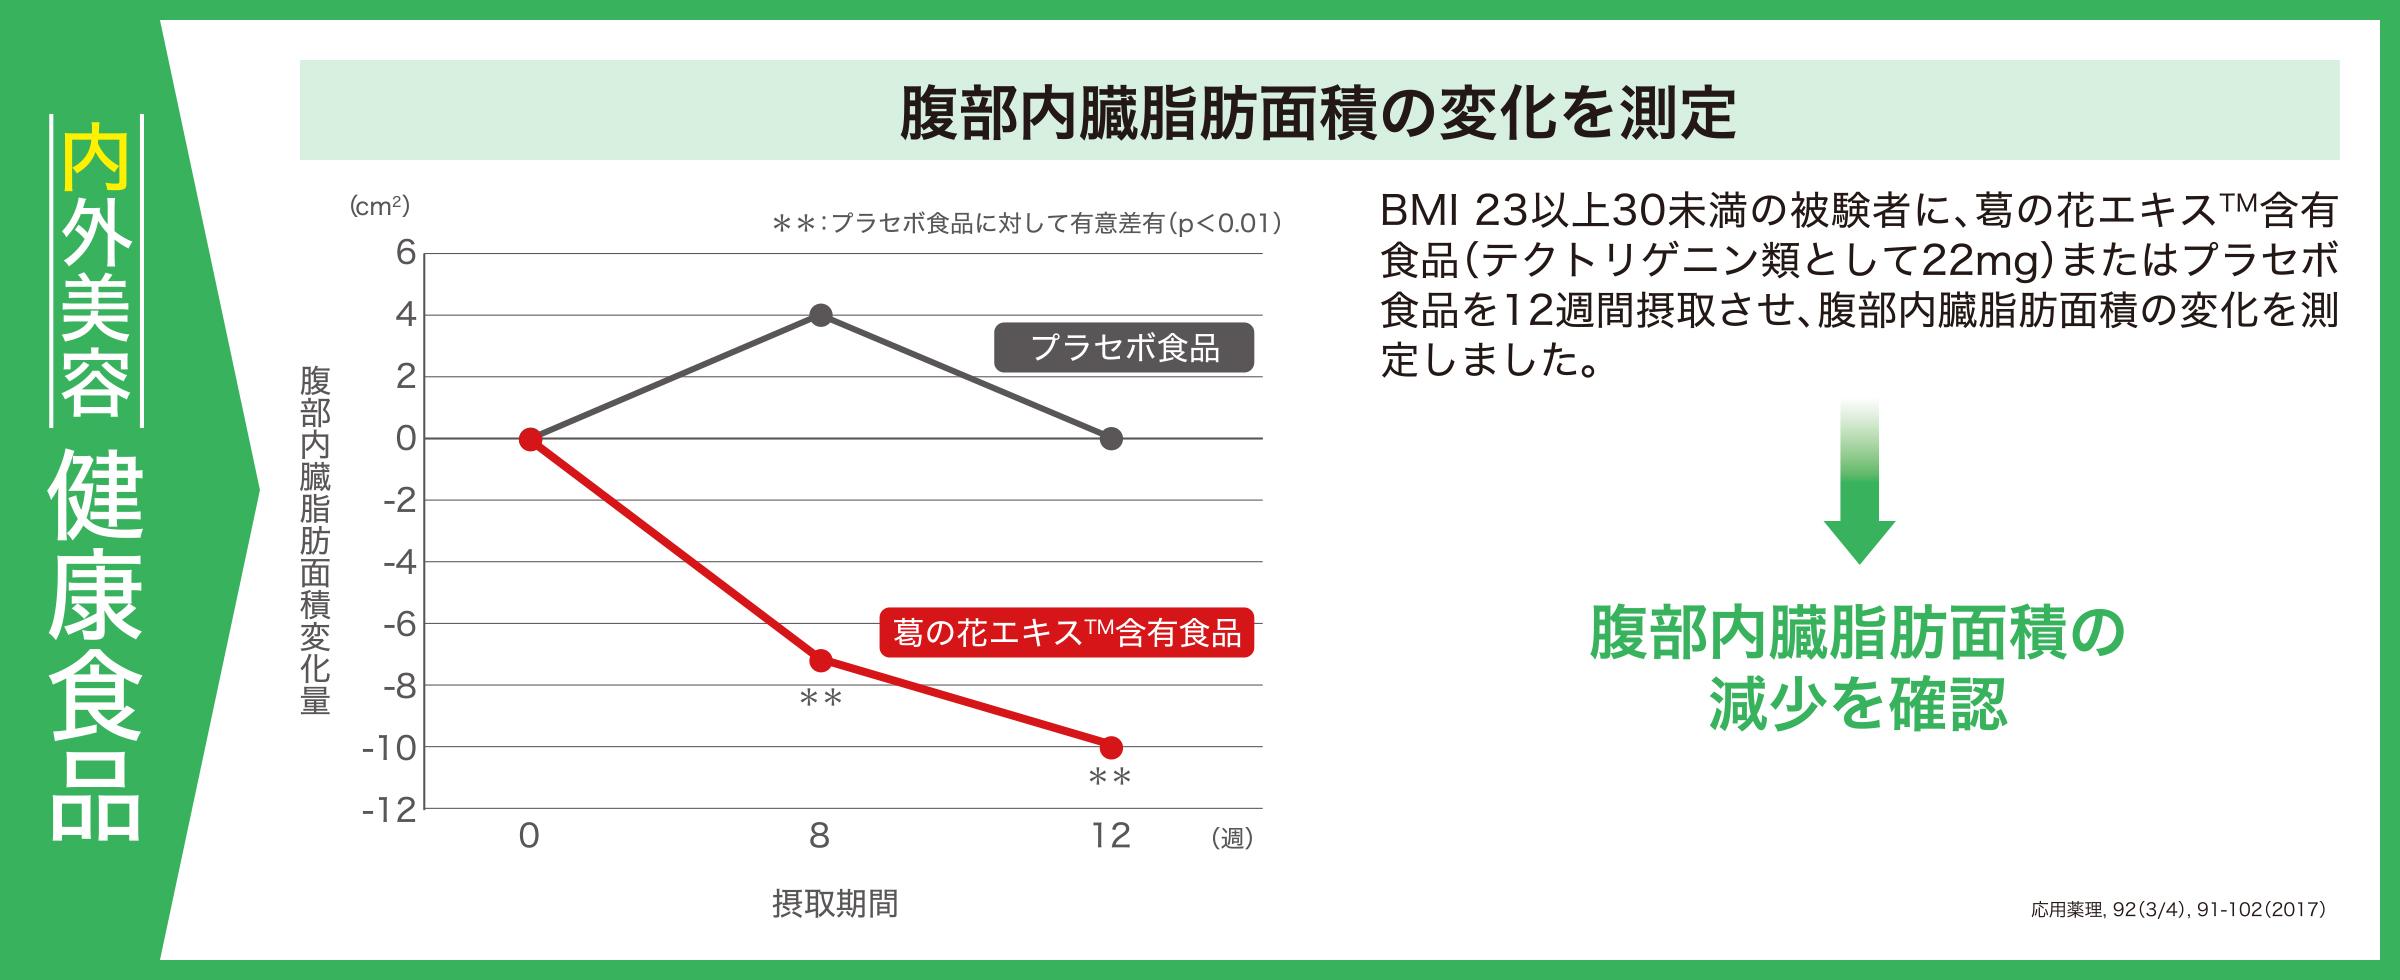 腹部内臓脂肪面積の変化を測定